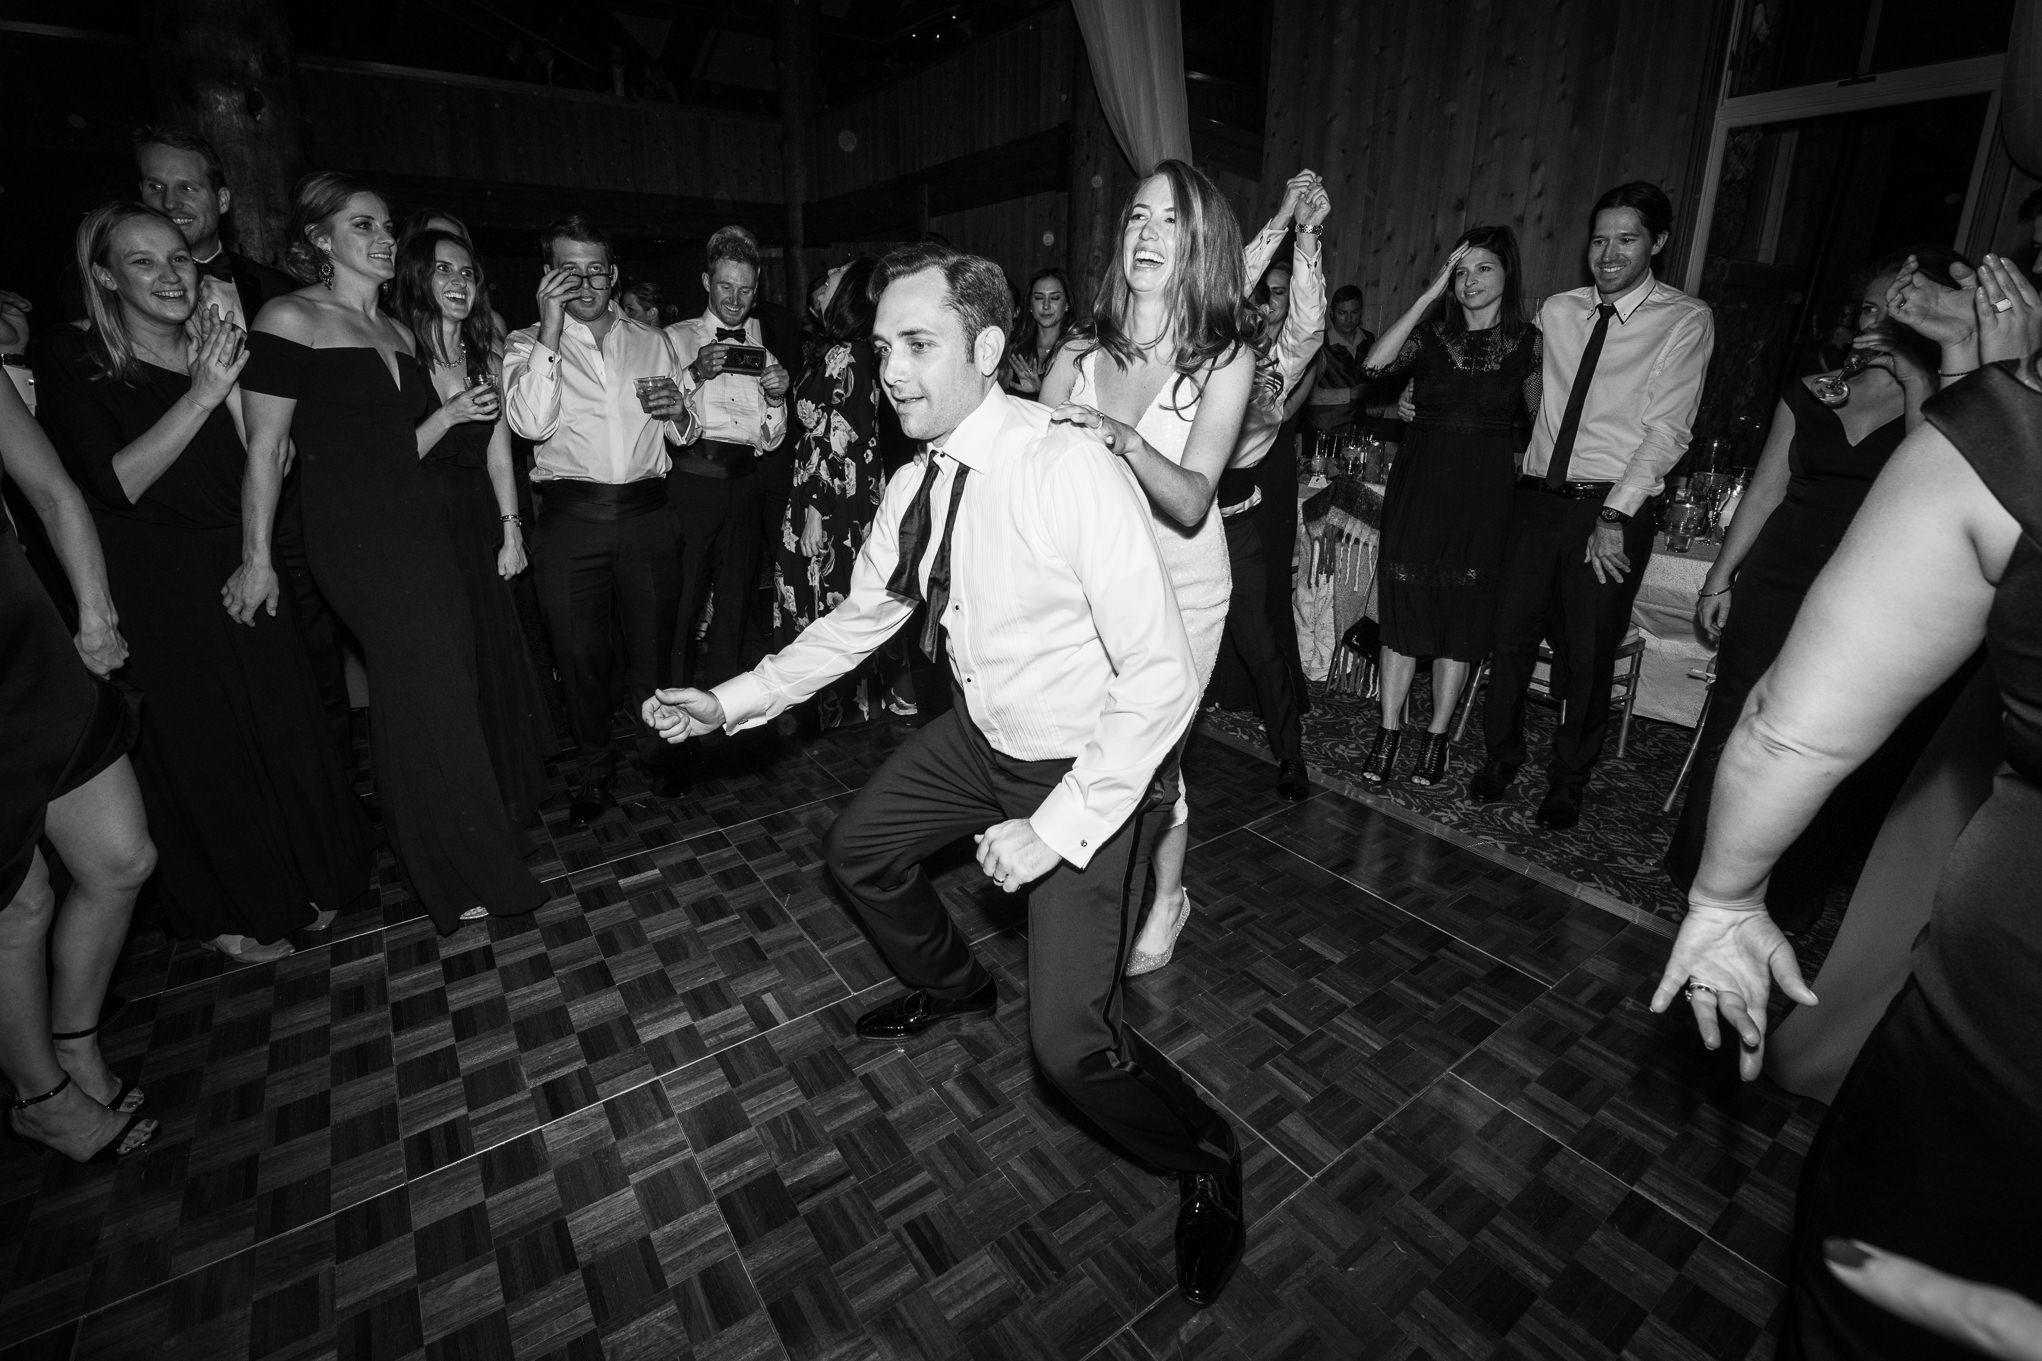 875_ONL_Mairin_Brian_Wedding_Trevor_Hooper_Photo.jpg